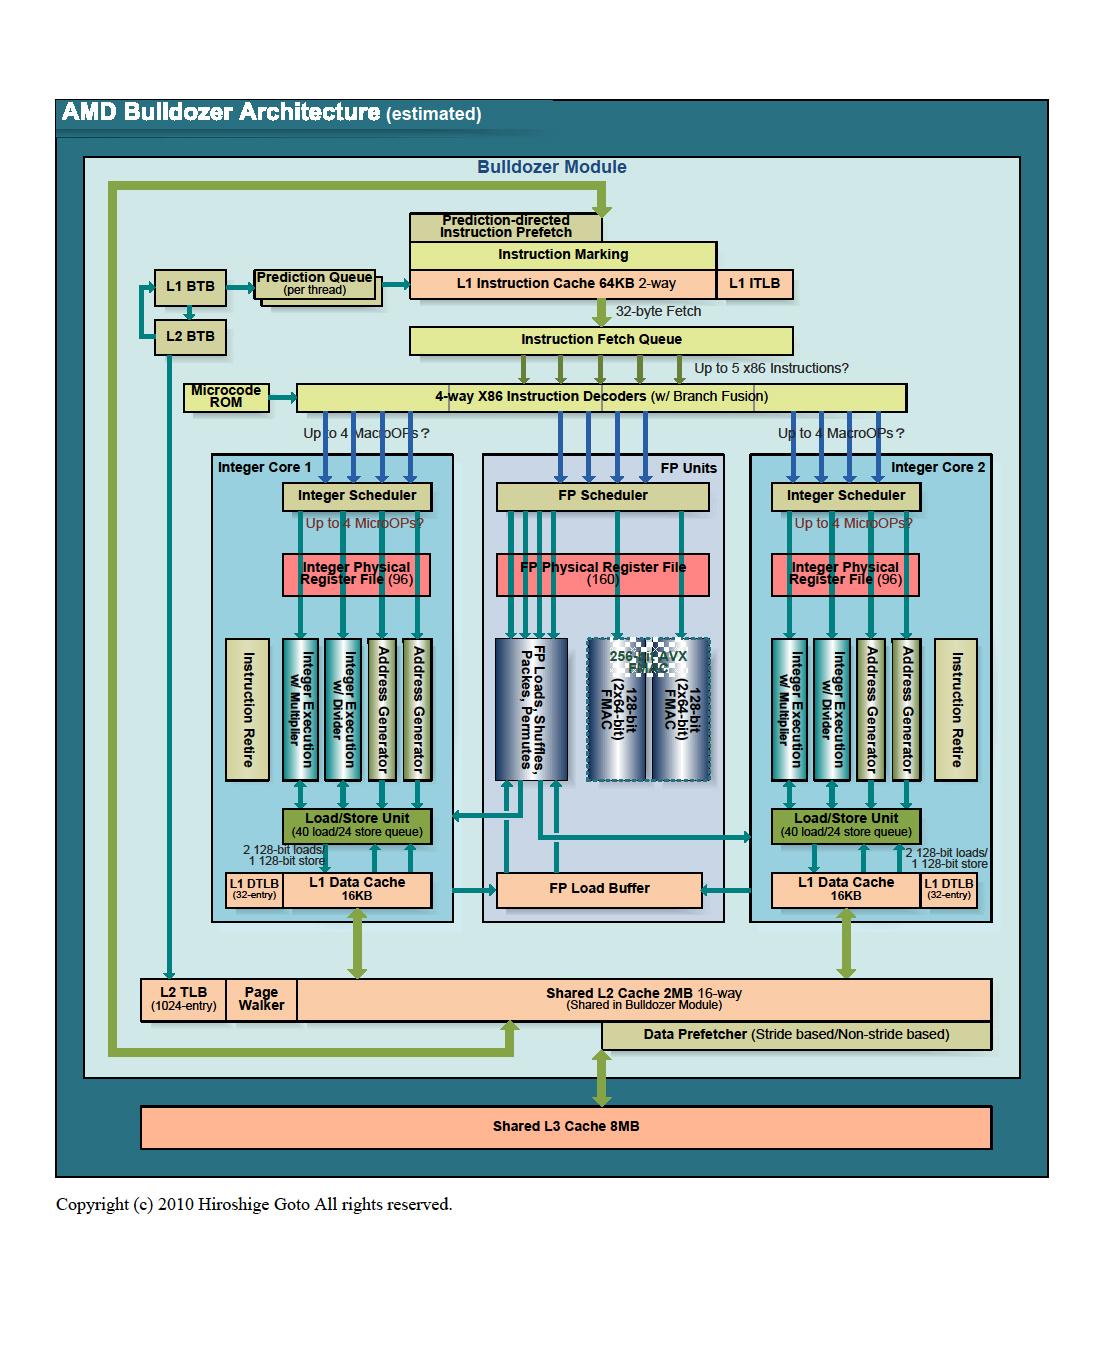 "Bulldozerのアーキテクチャ<br>PDF版は<a href=""/video/pcw/docs/450/030/p15.pdf"">こちら</a>"